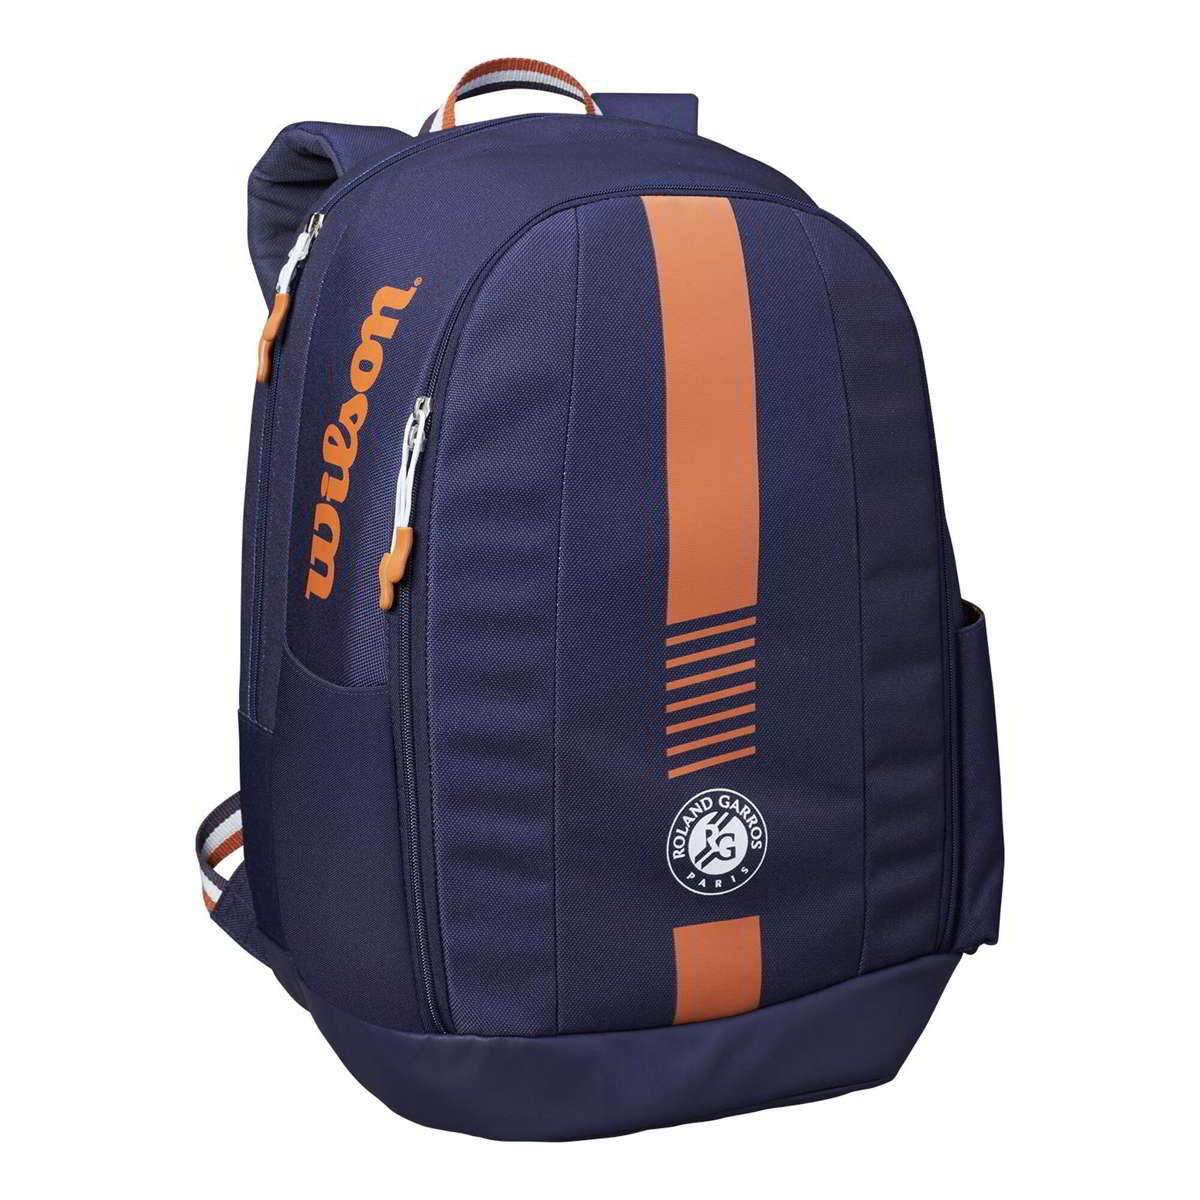 Wilson Roland Garros Team Backpack